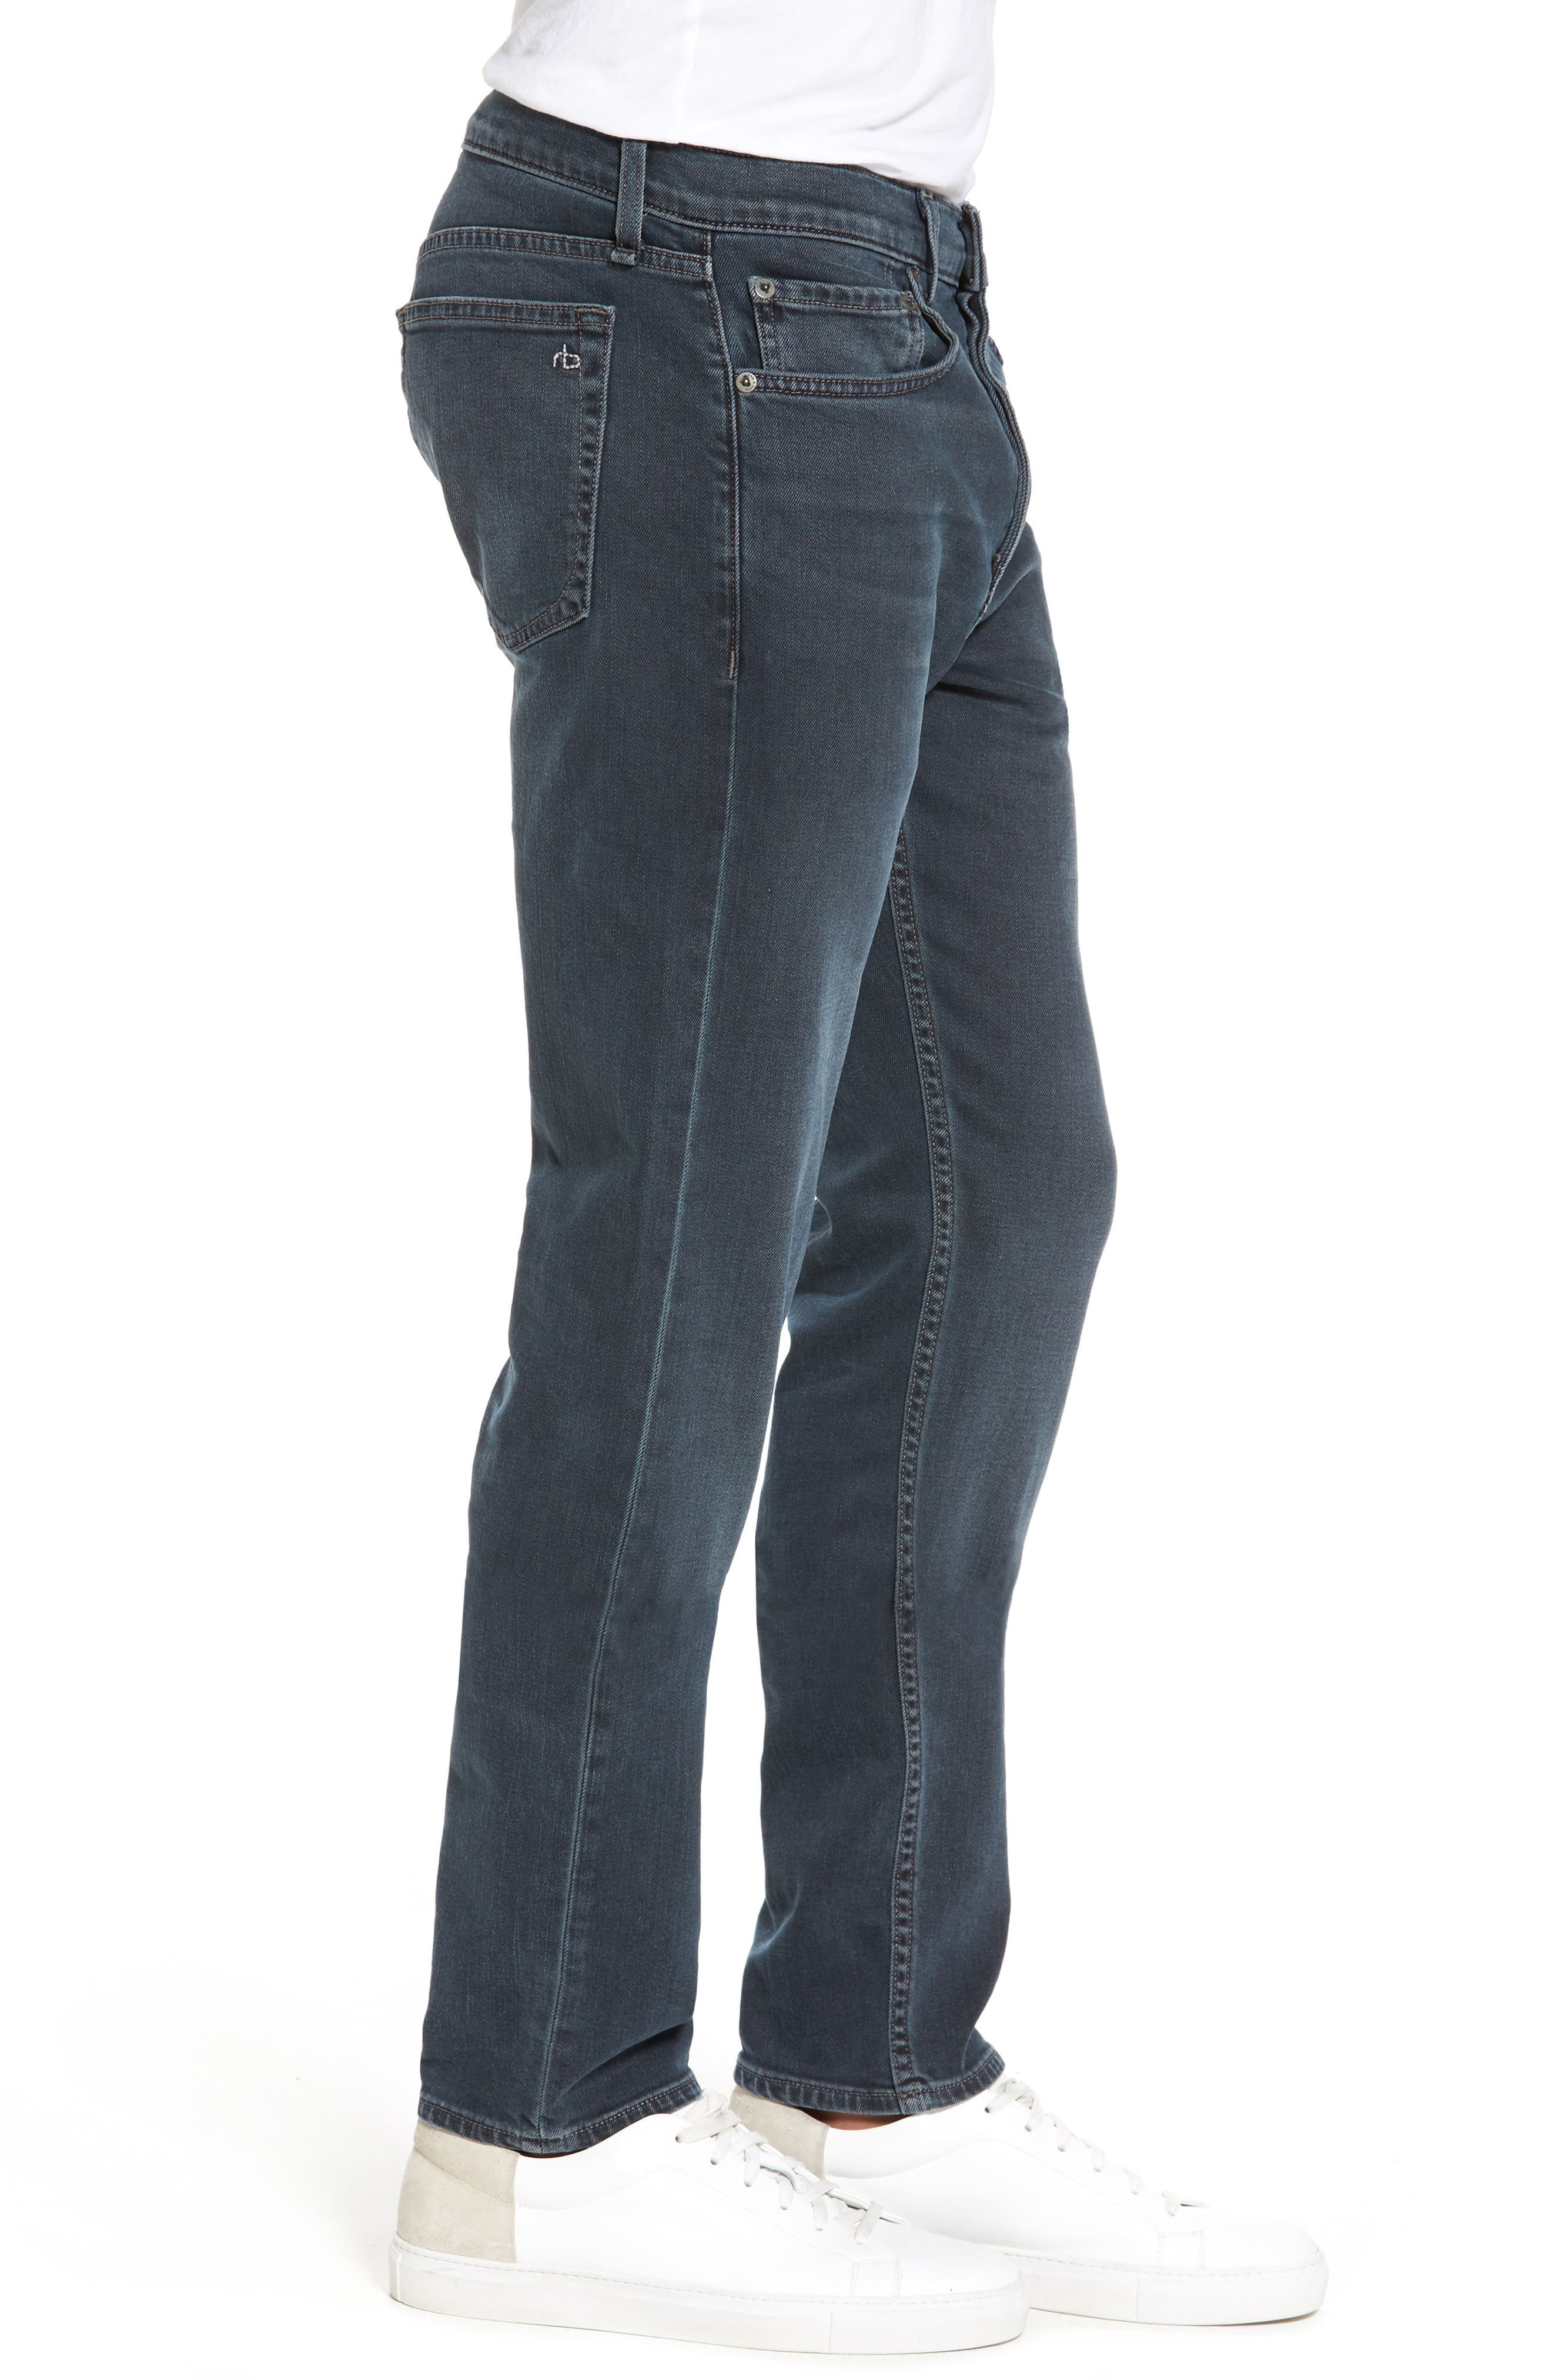 Fit 2 Slim Fit Jean,                             Alternate thumbnail 3, color,                             MINNA